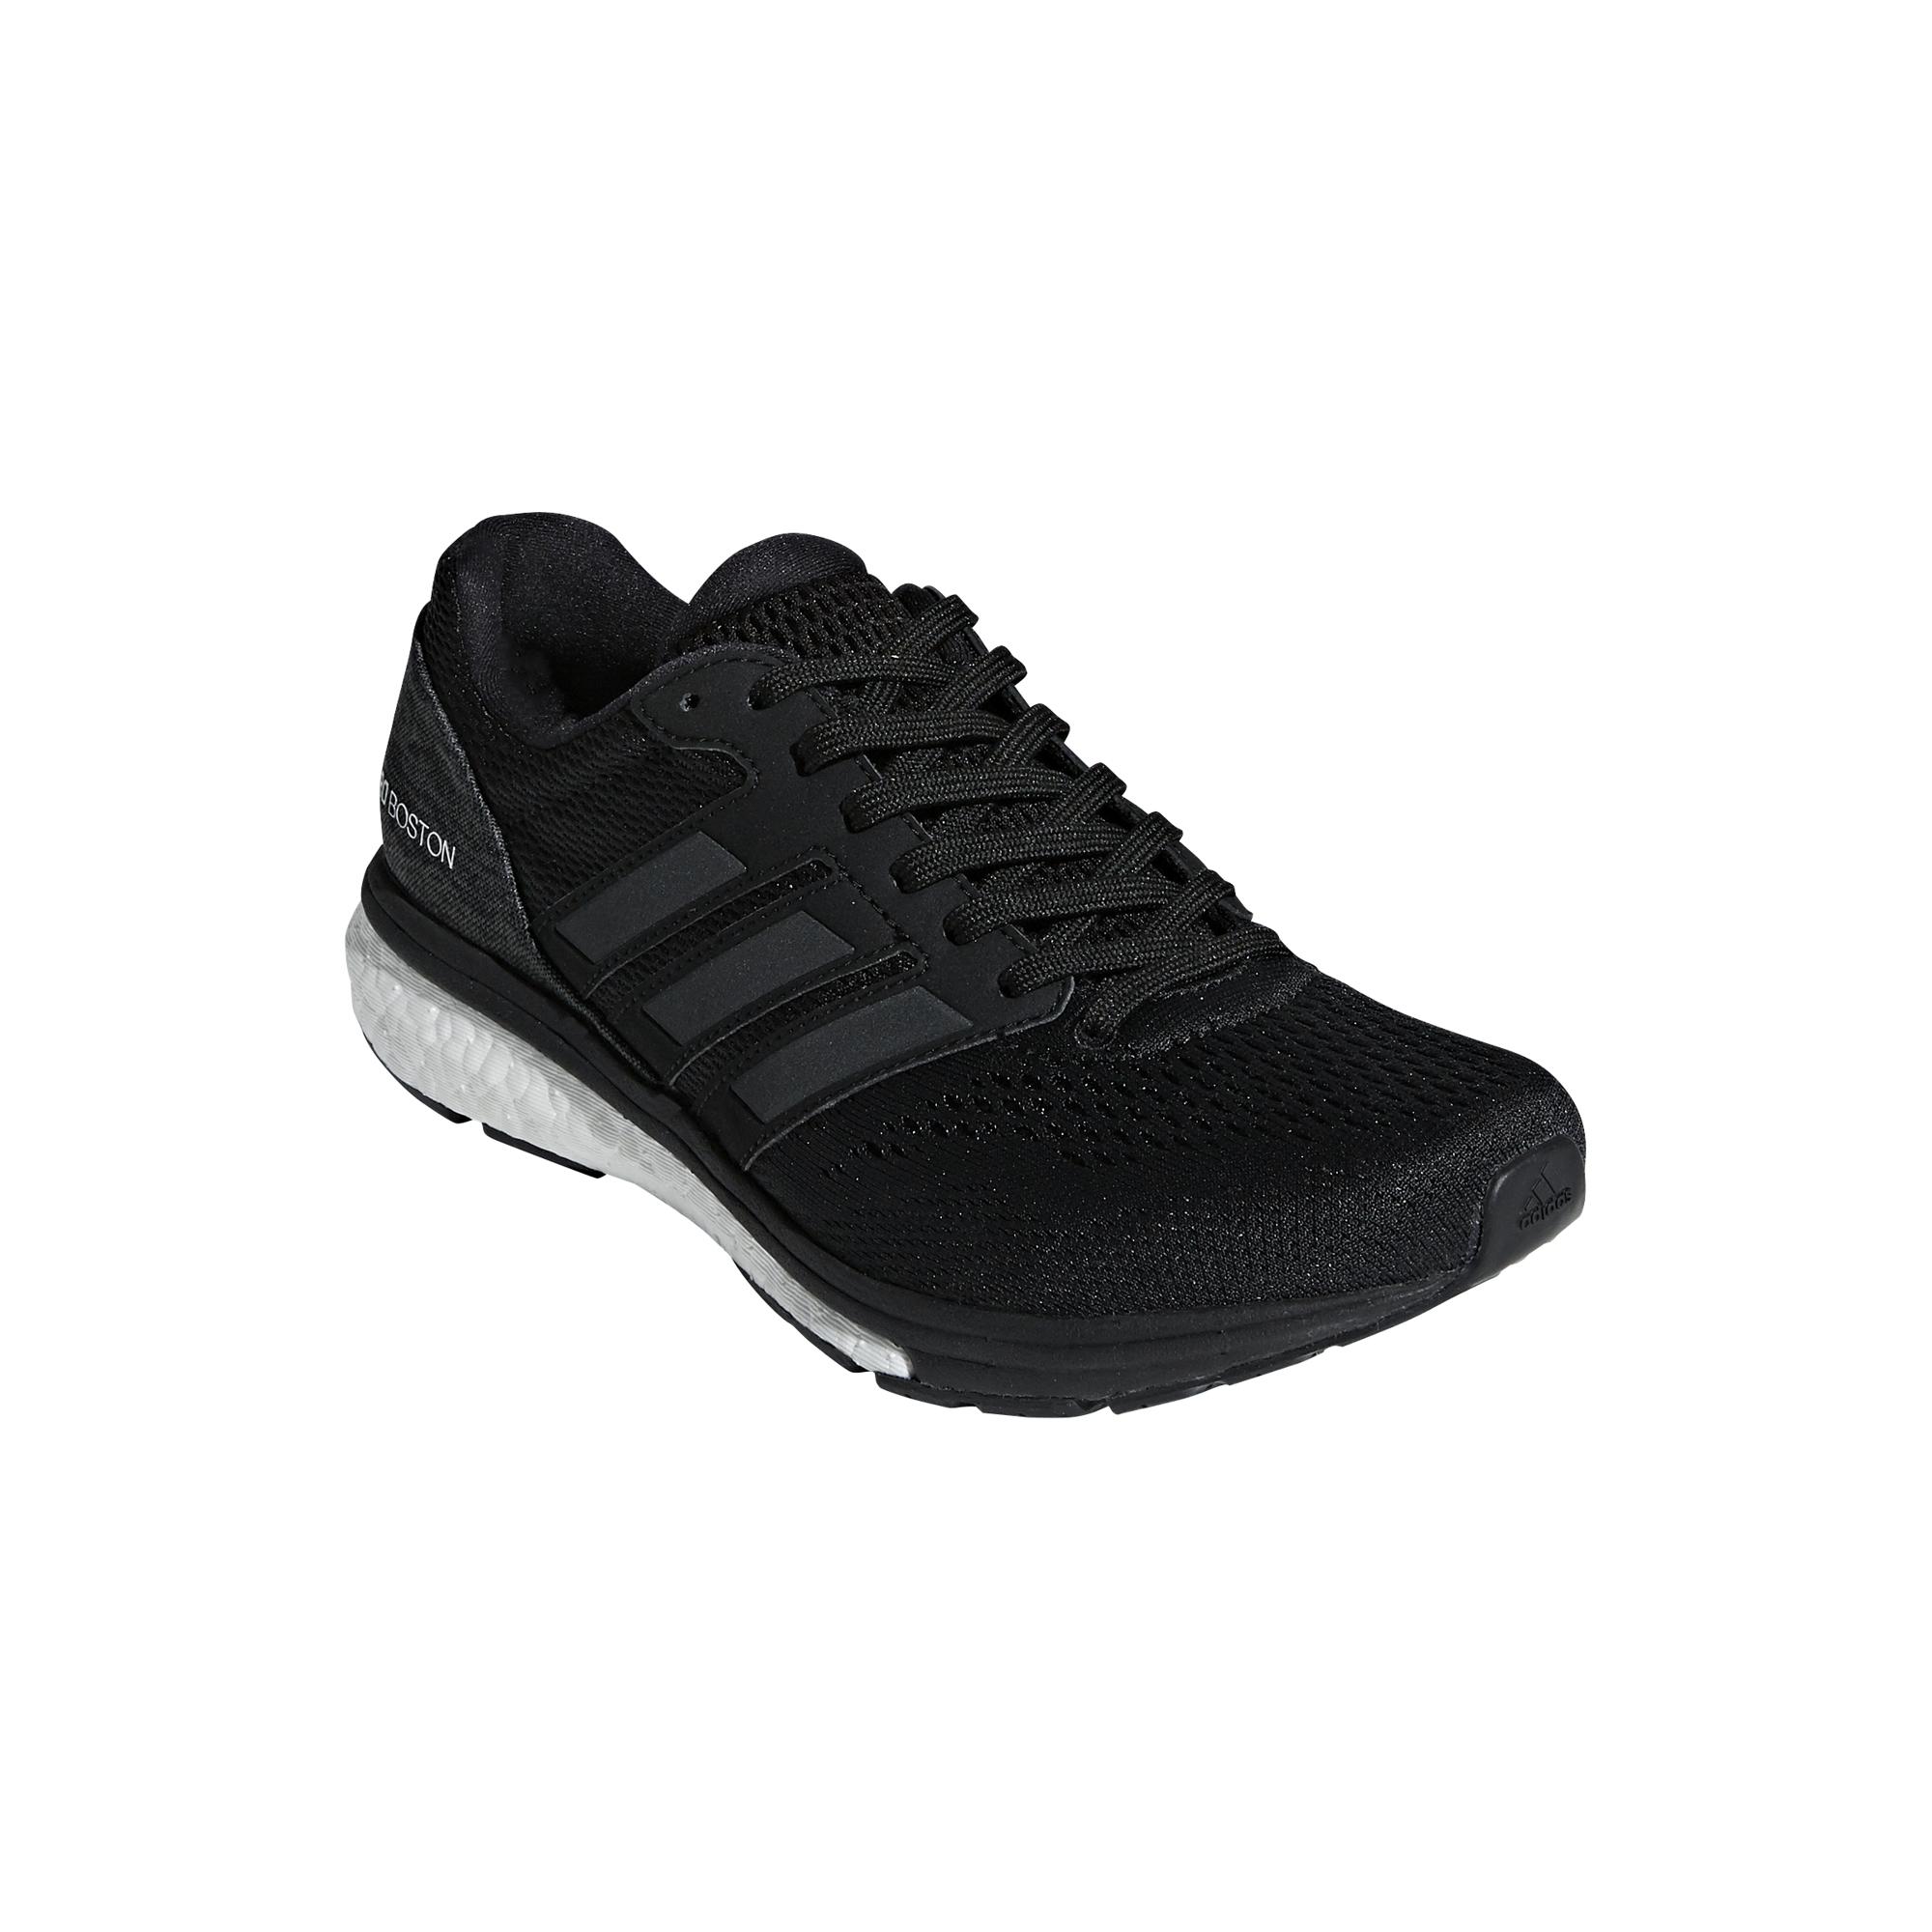 best service 4a94c a91d5 Chaussures femme adidas adizero Boston 7